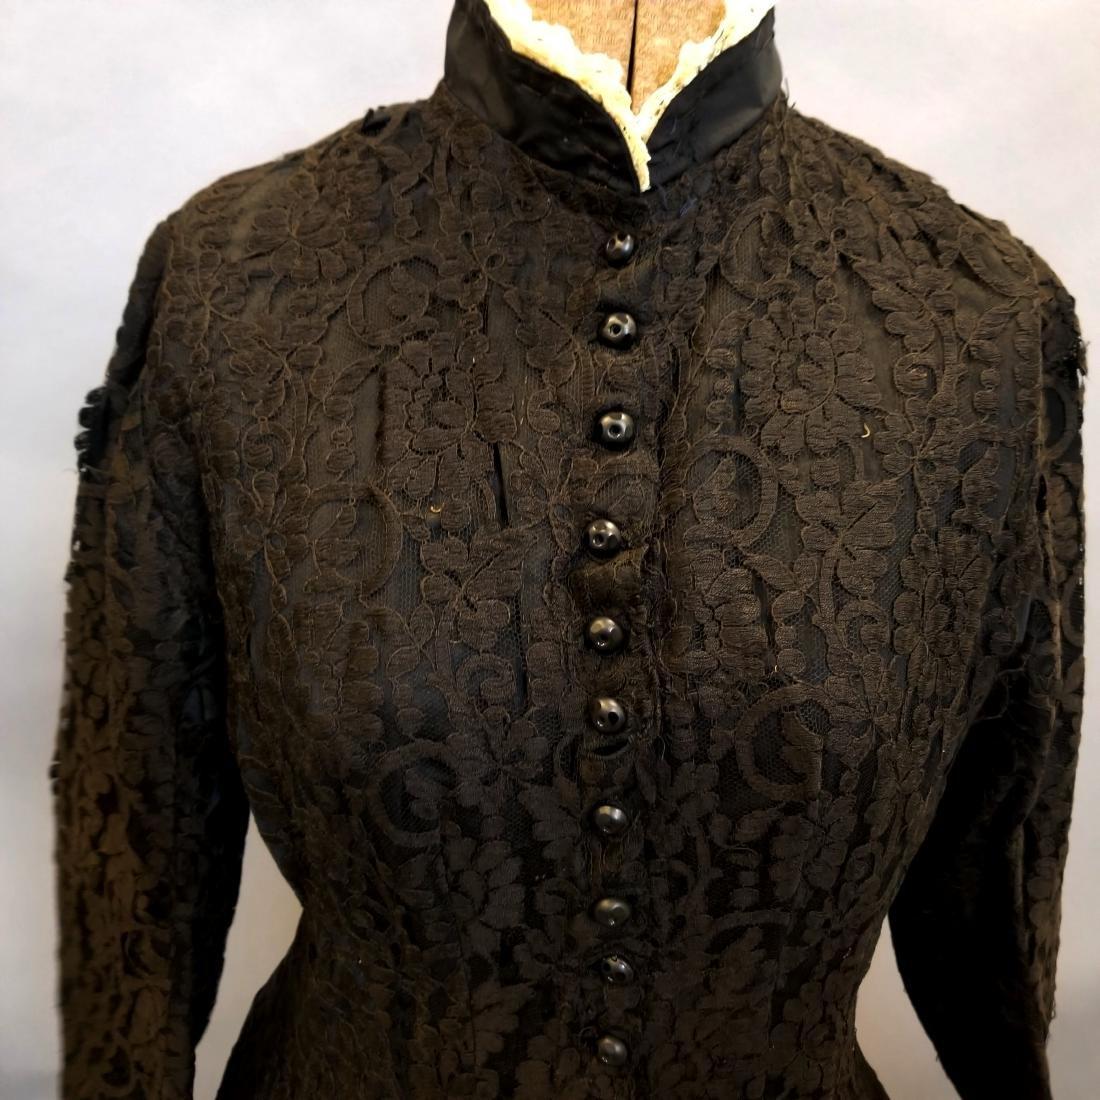 Black Lace Reception Dress - 7